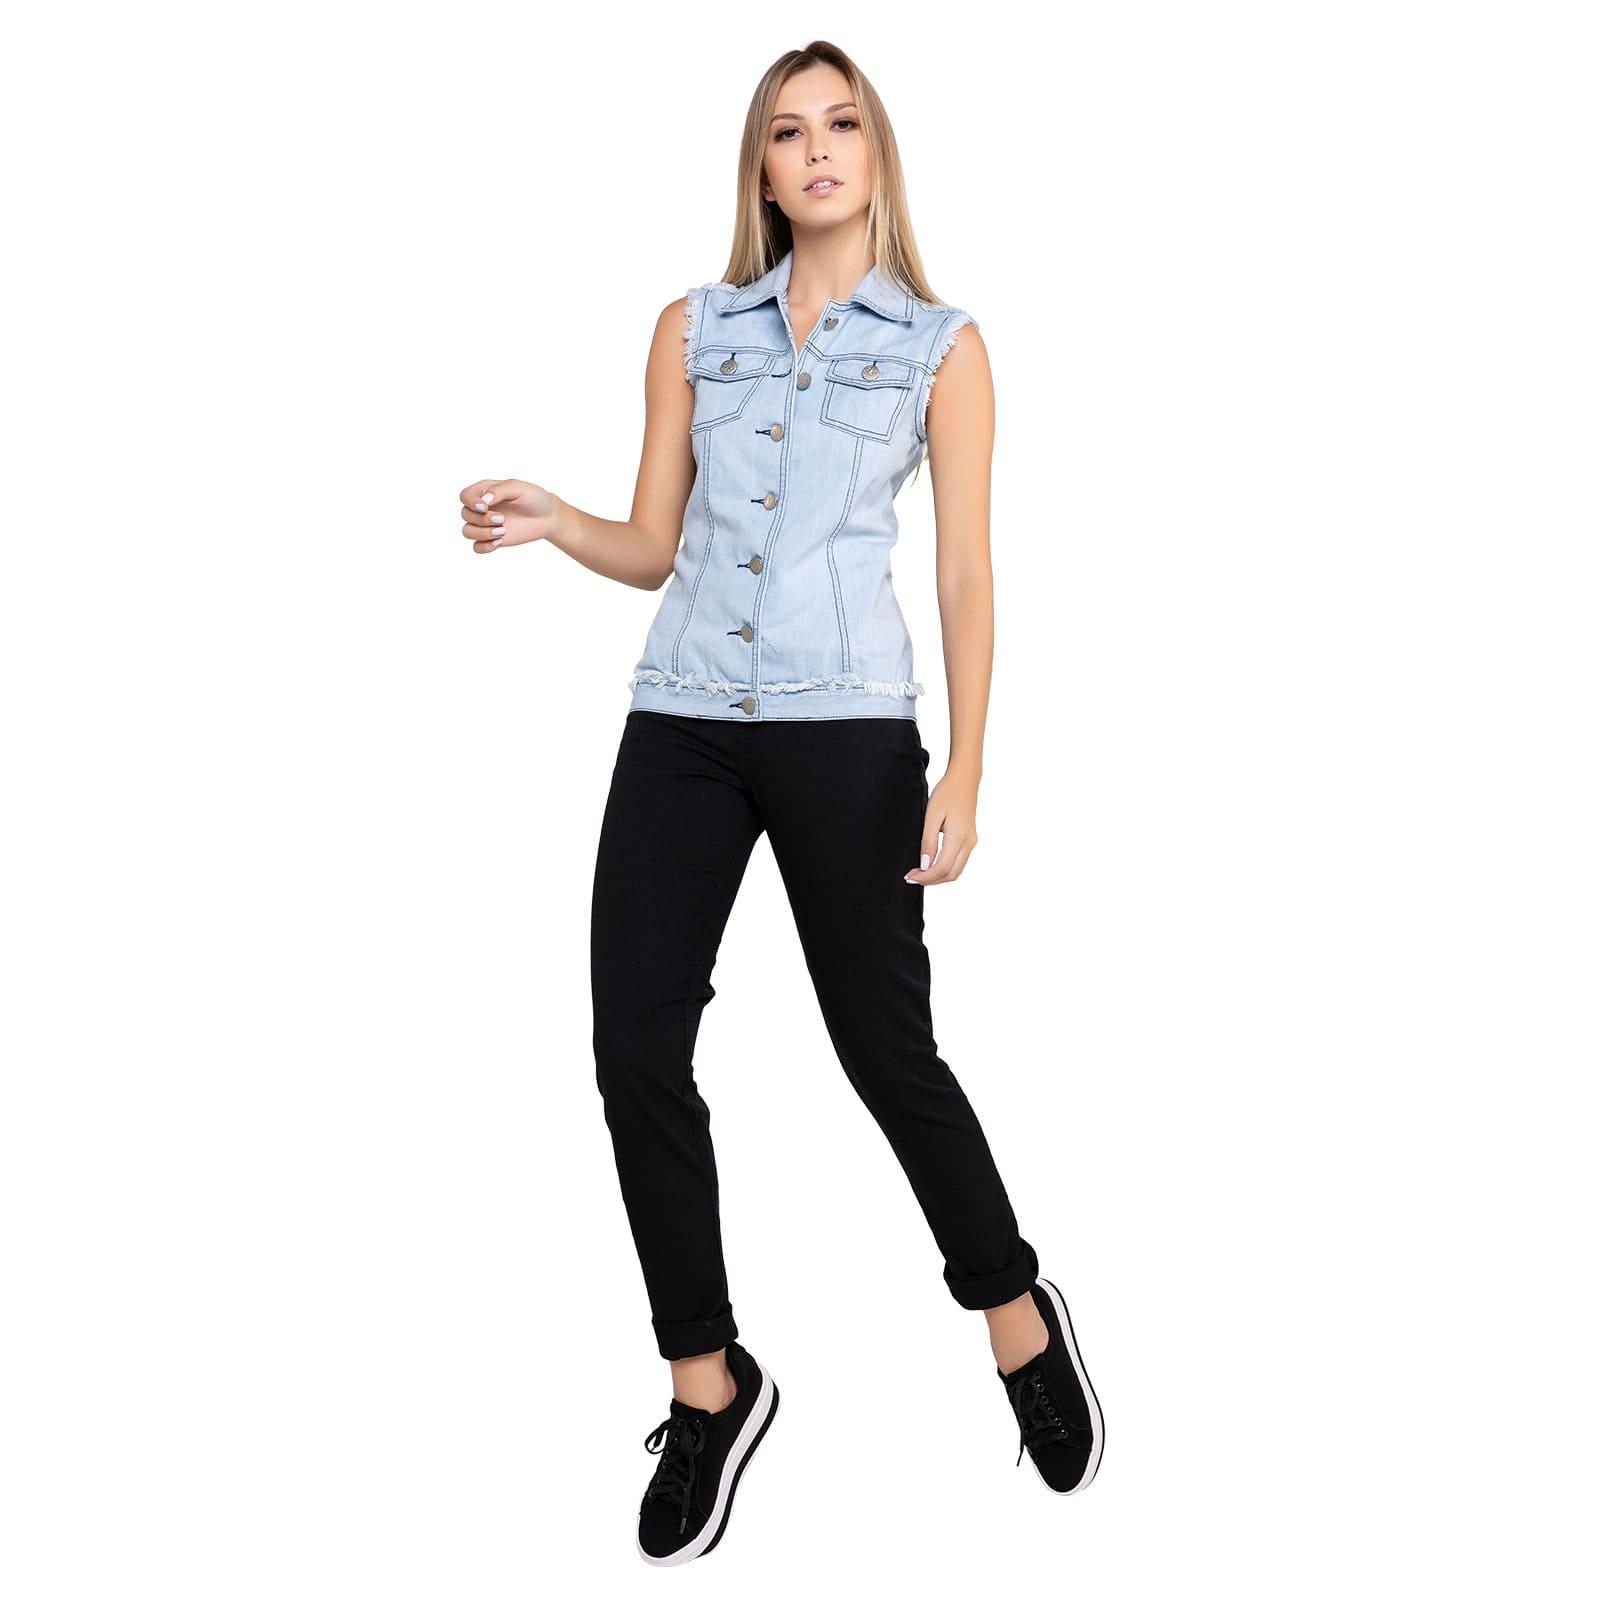 Colete Feminino Jeans